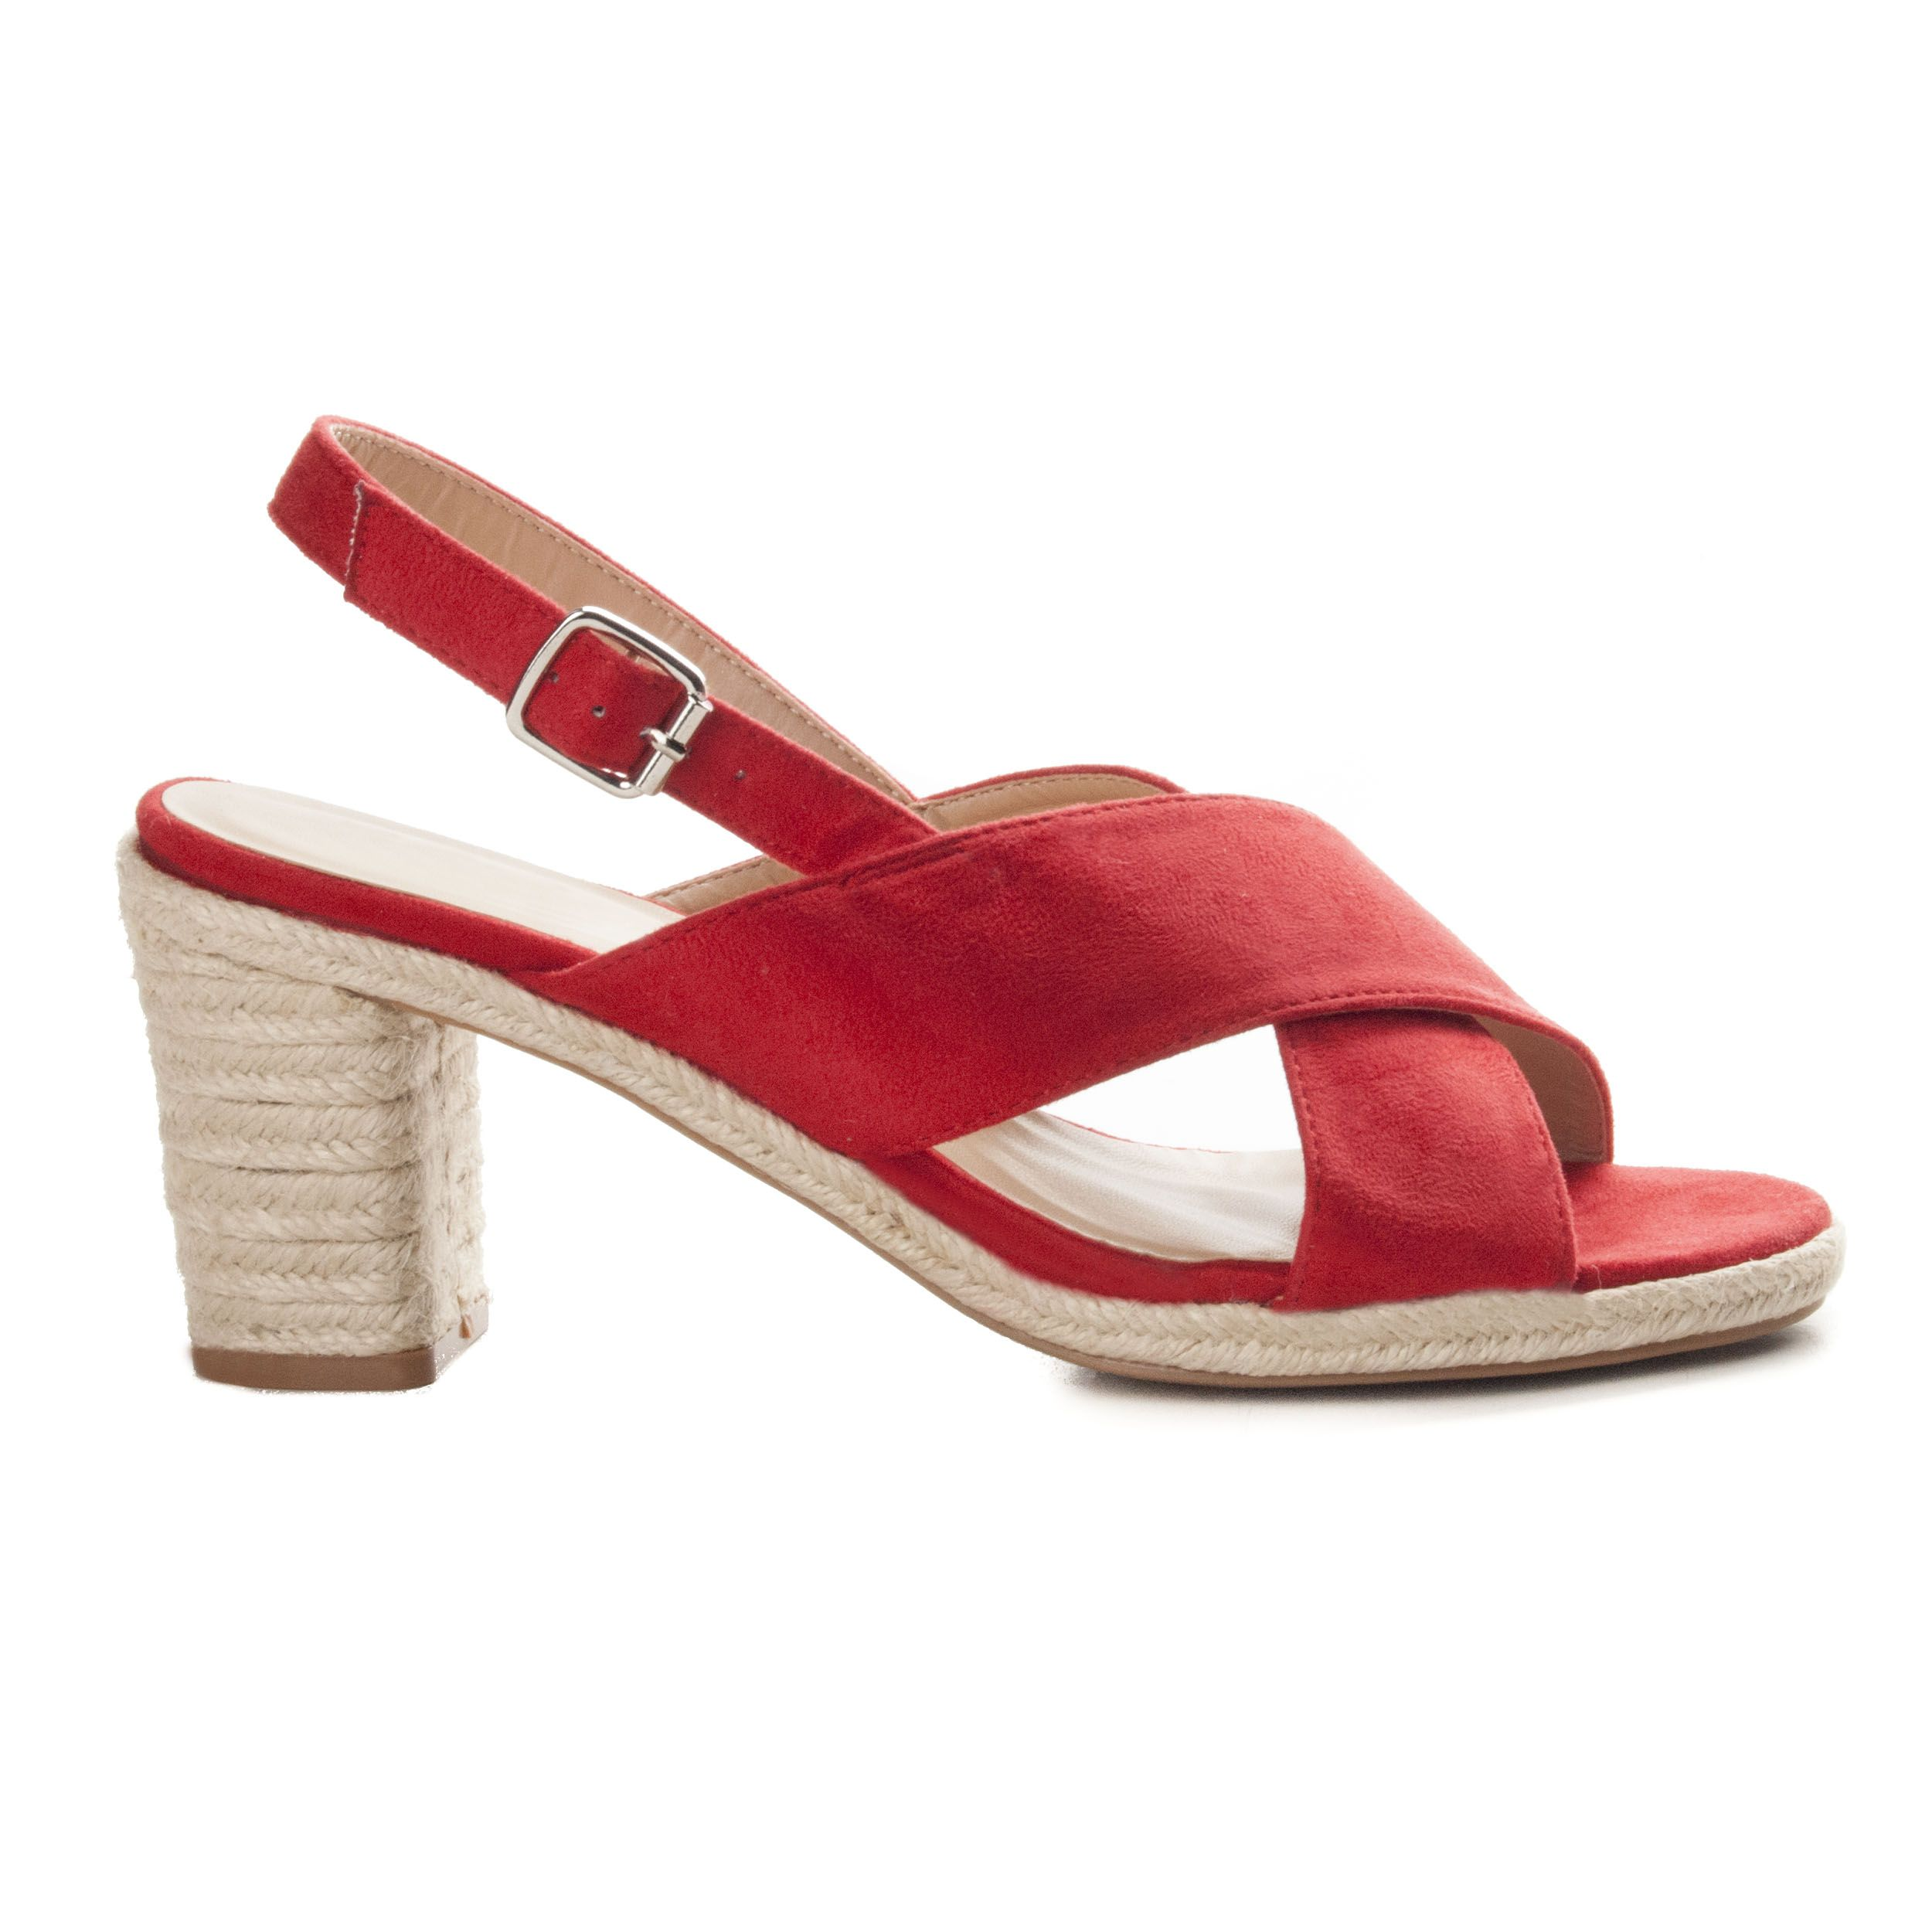 Montevita Block Heel Sandal in Red